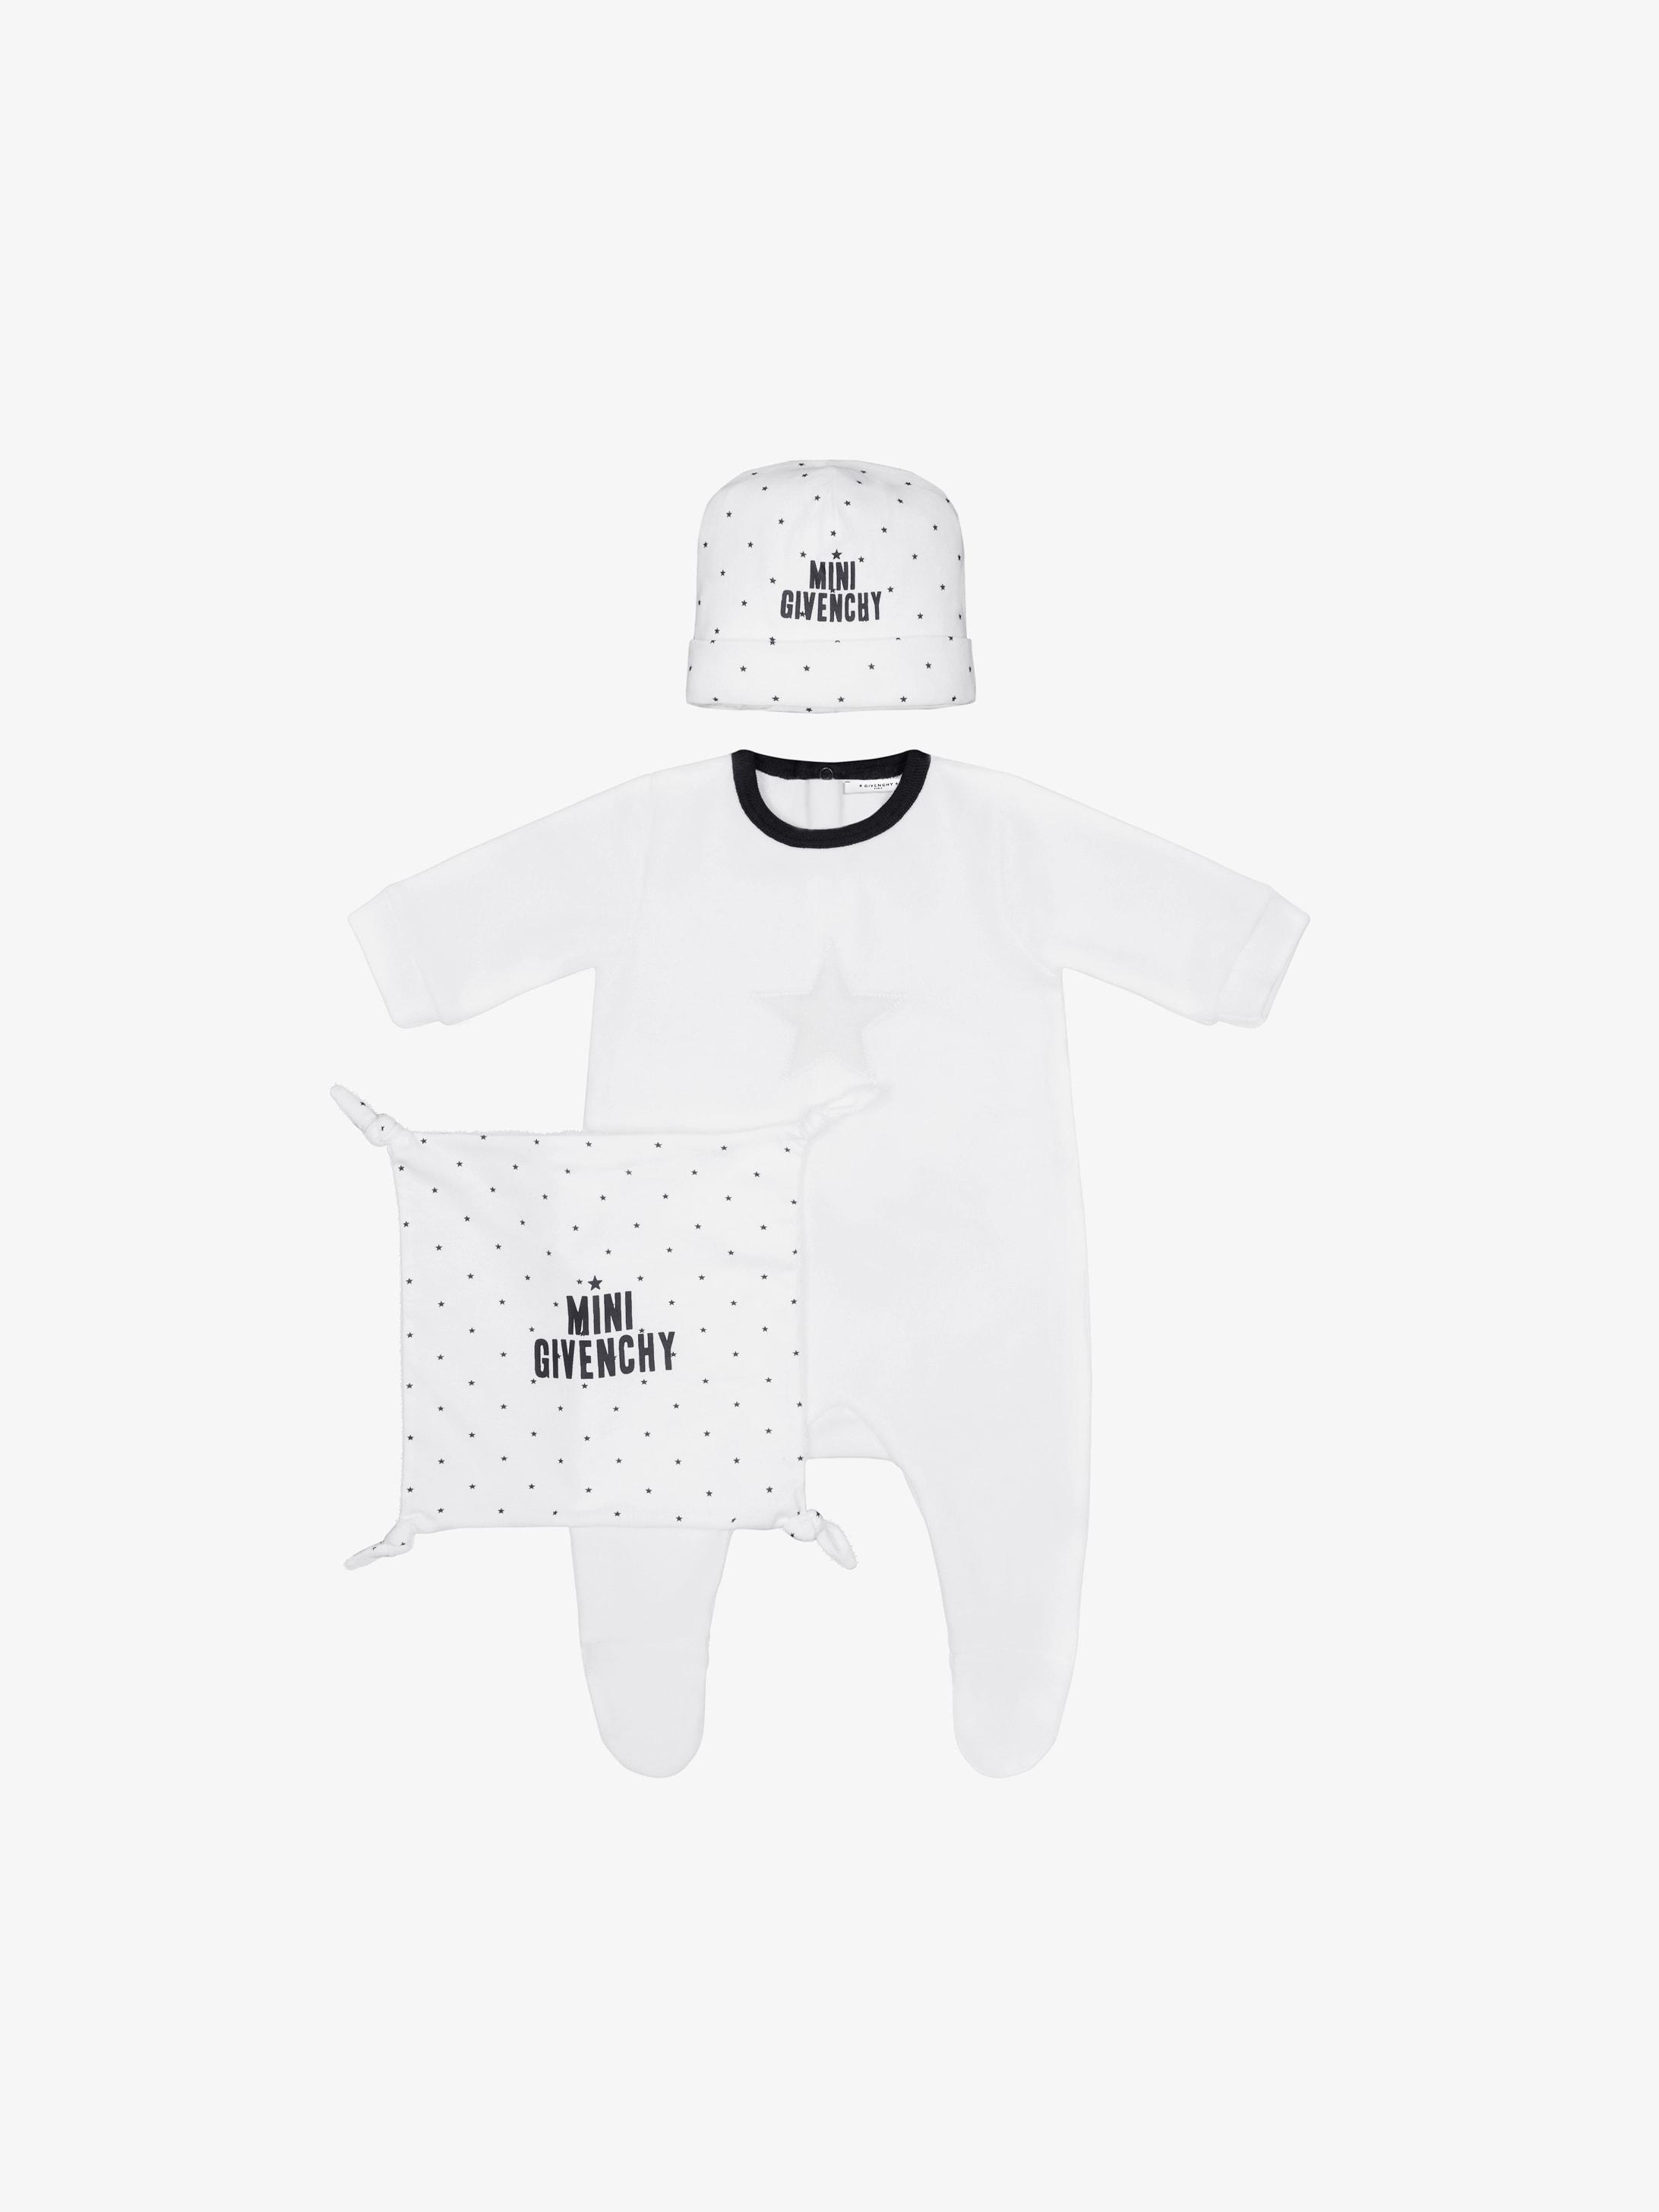 MINI GIVENCHY baby gift set